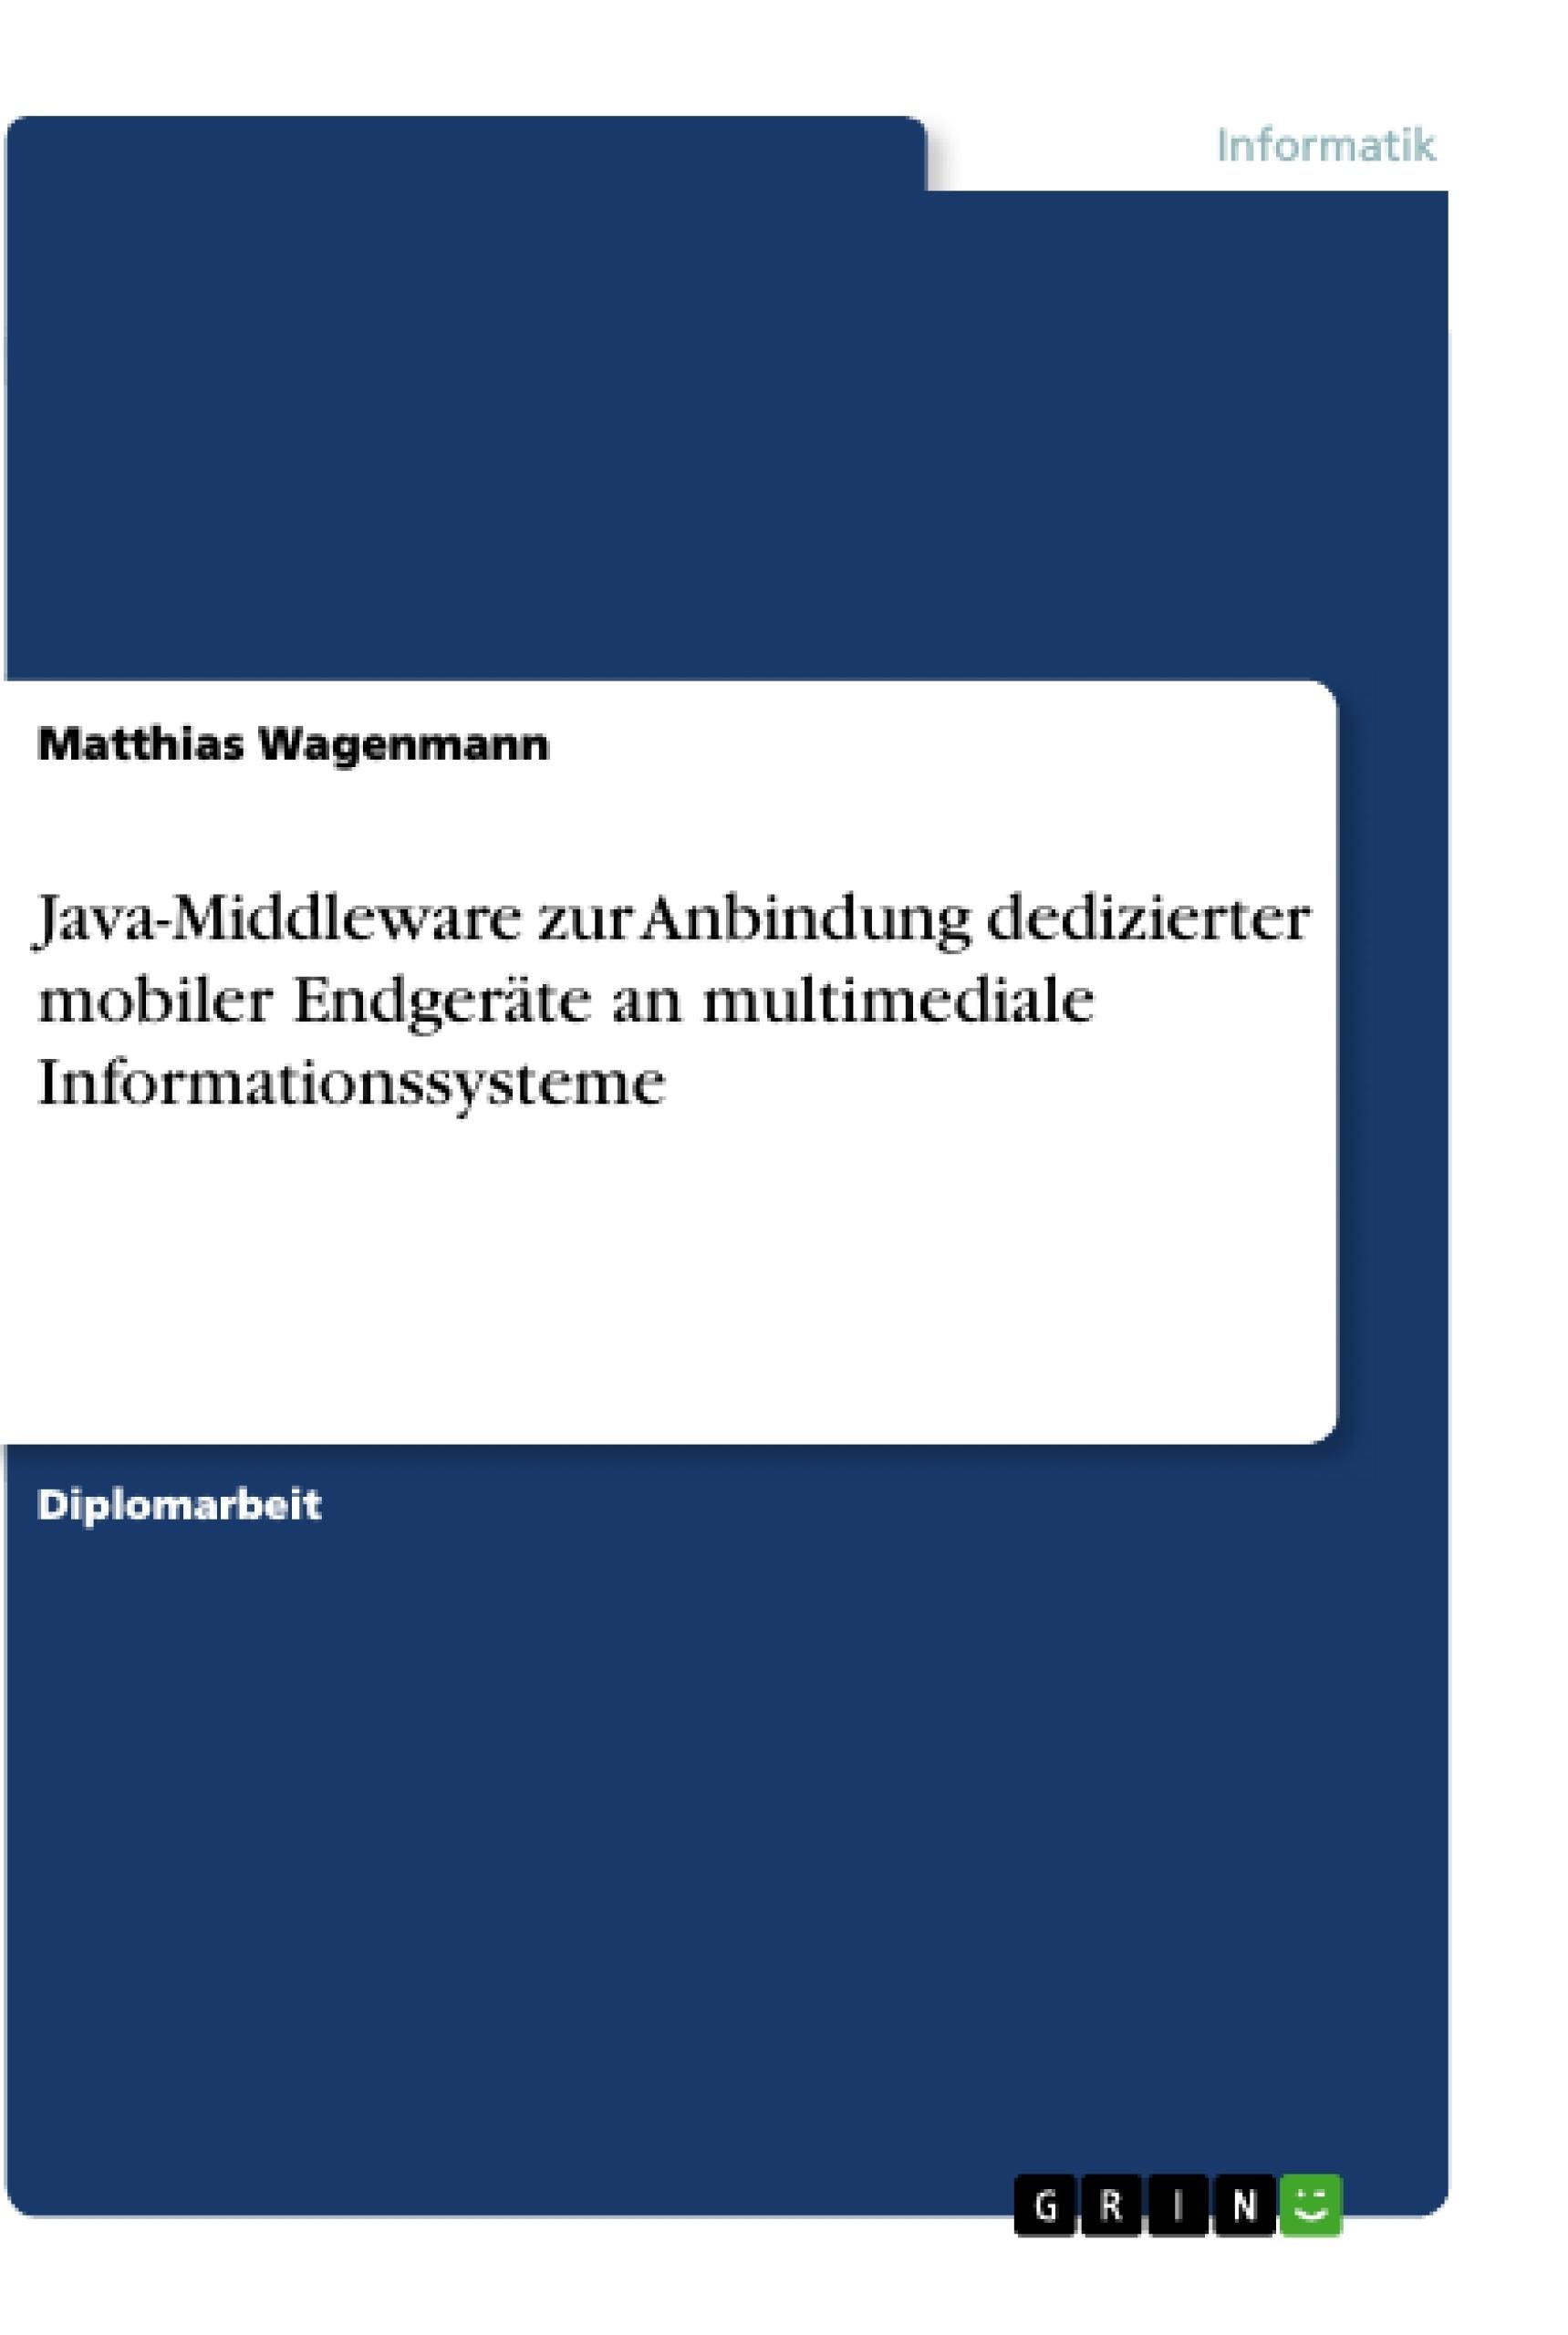 Titel: Java-Middleware zur Anbindung dedizierter mobiler Endgeräte an multimediale Informationssysteme